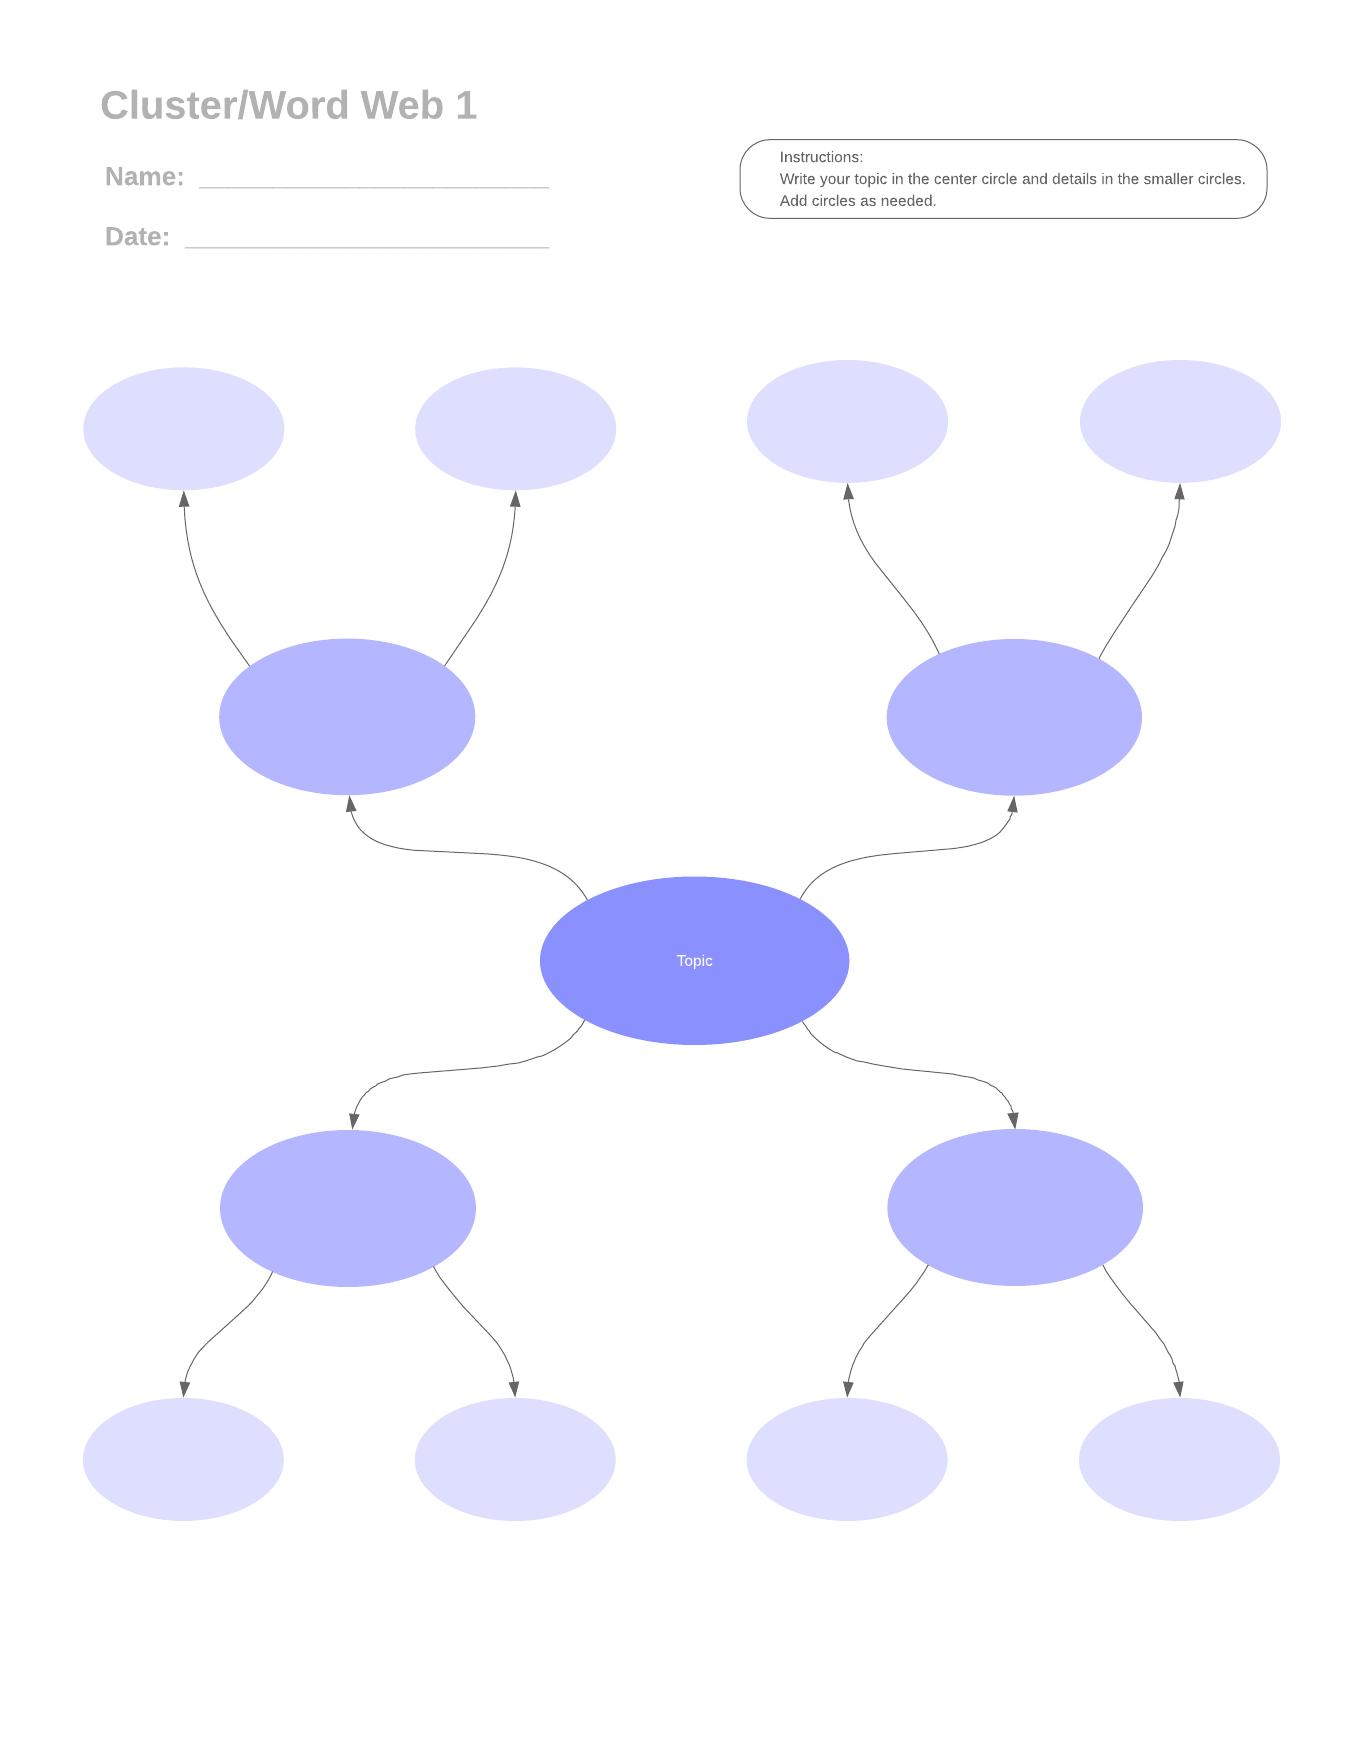 cluster word web version 1